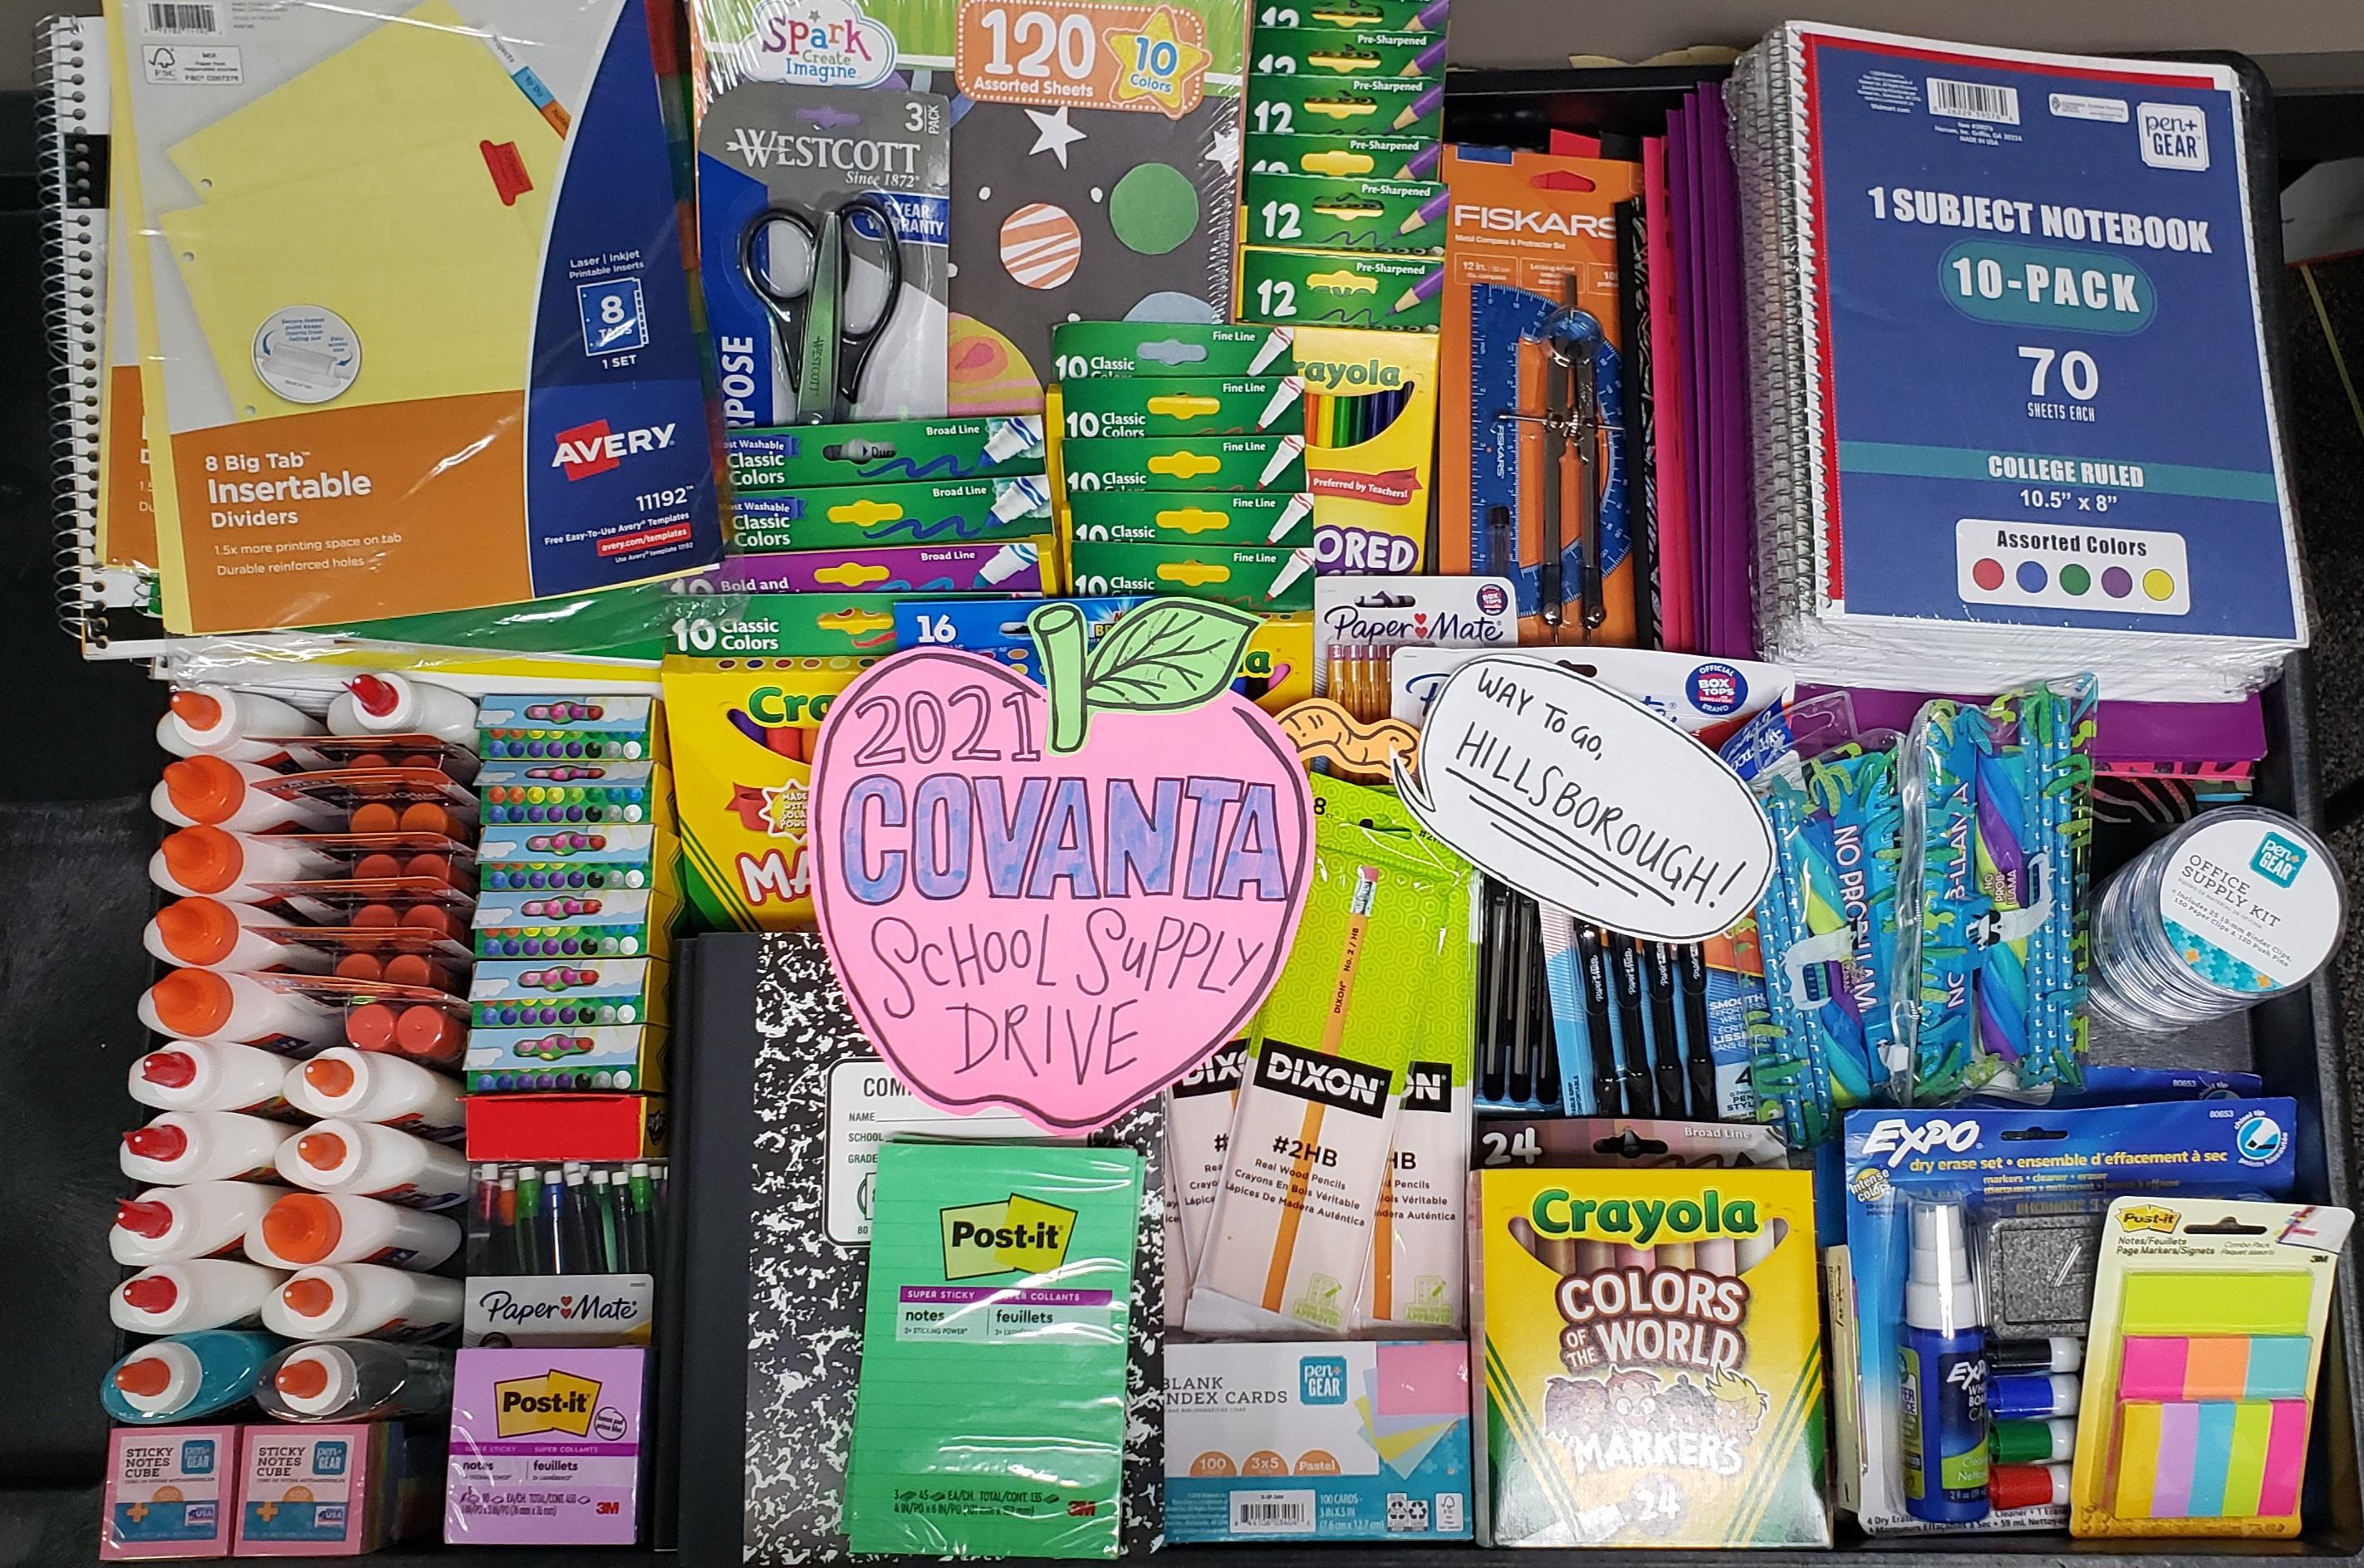 Covanta Hillsborough Supports Local Elementary School